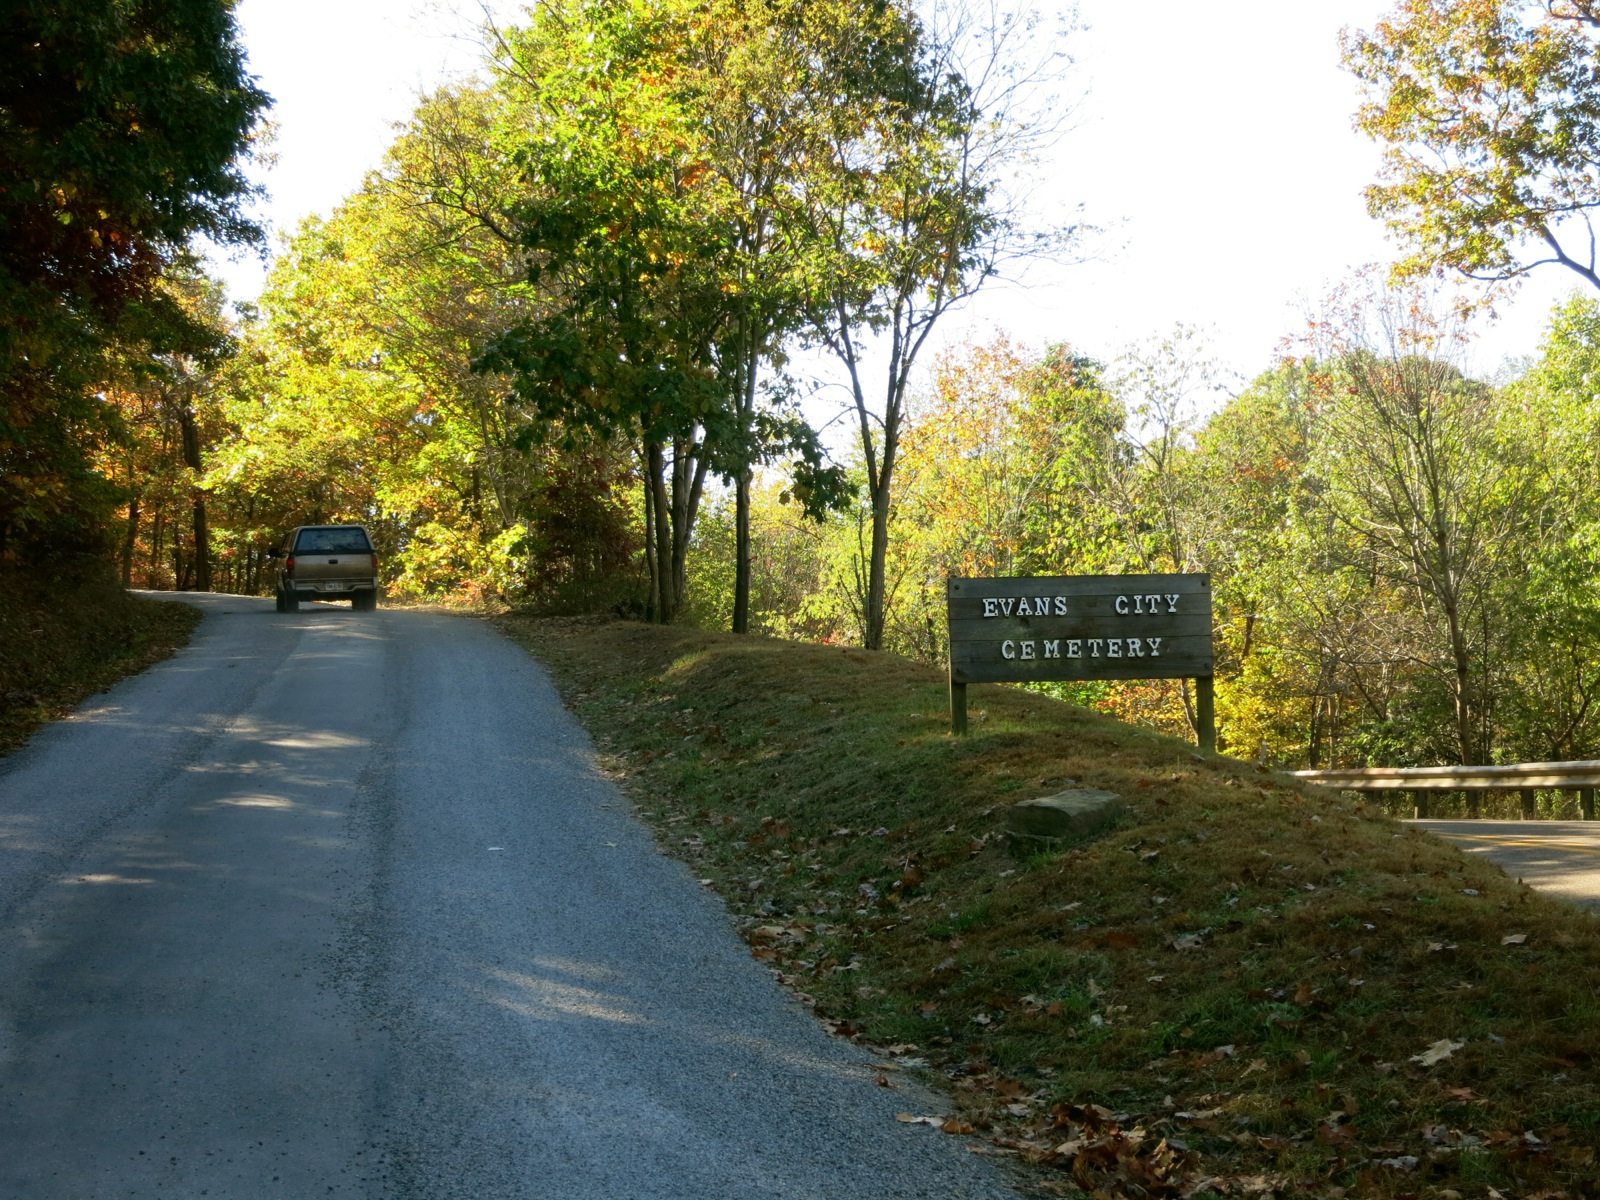 Zombie Town- Evans City Cemetery